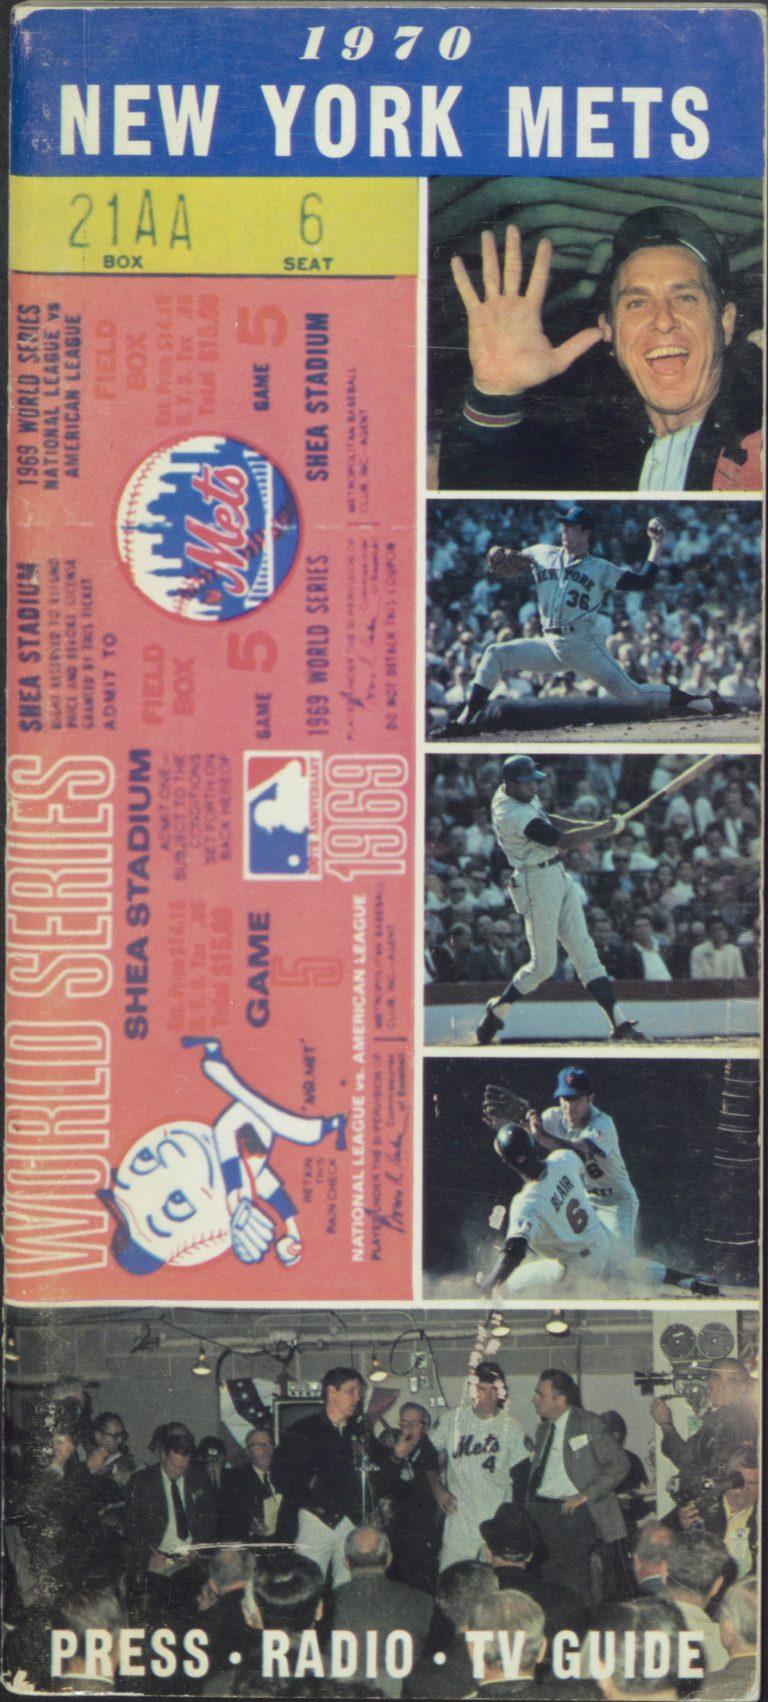 1970 Press-Radio-TV Guide: Celebrating the World Series